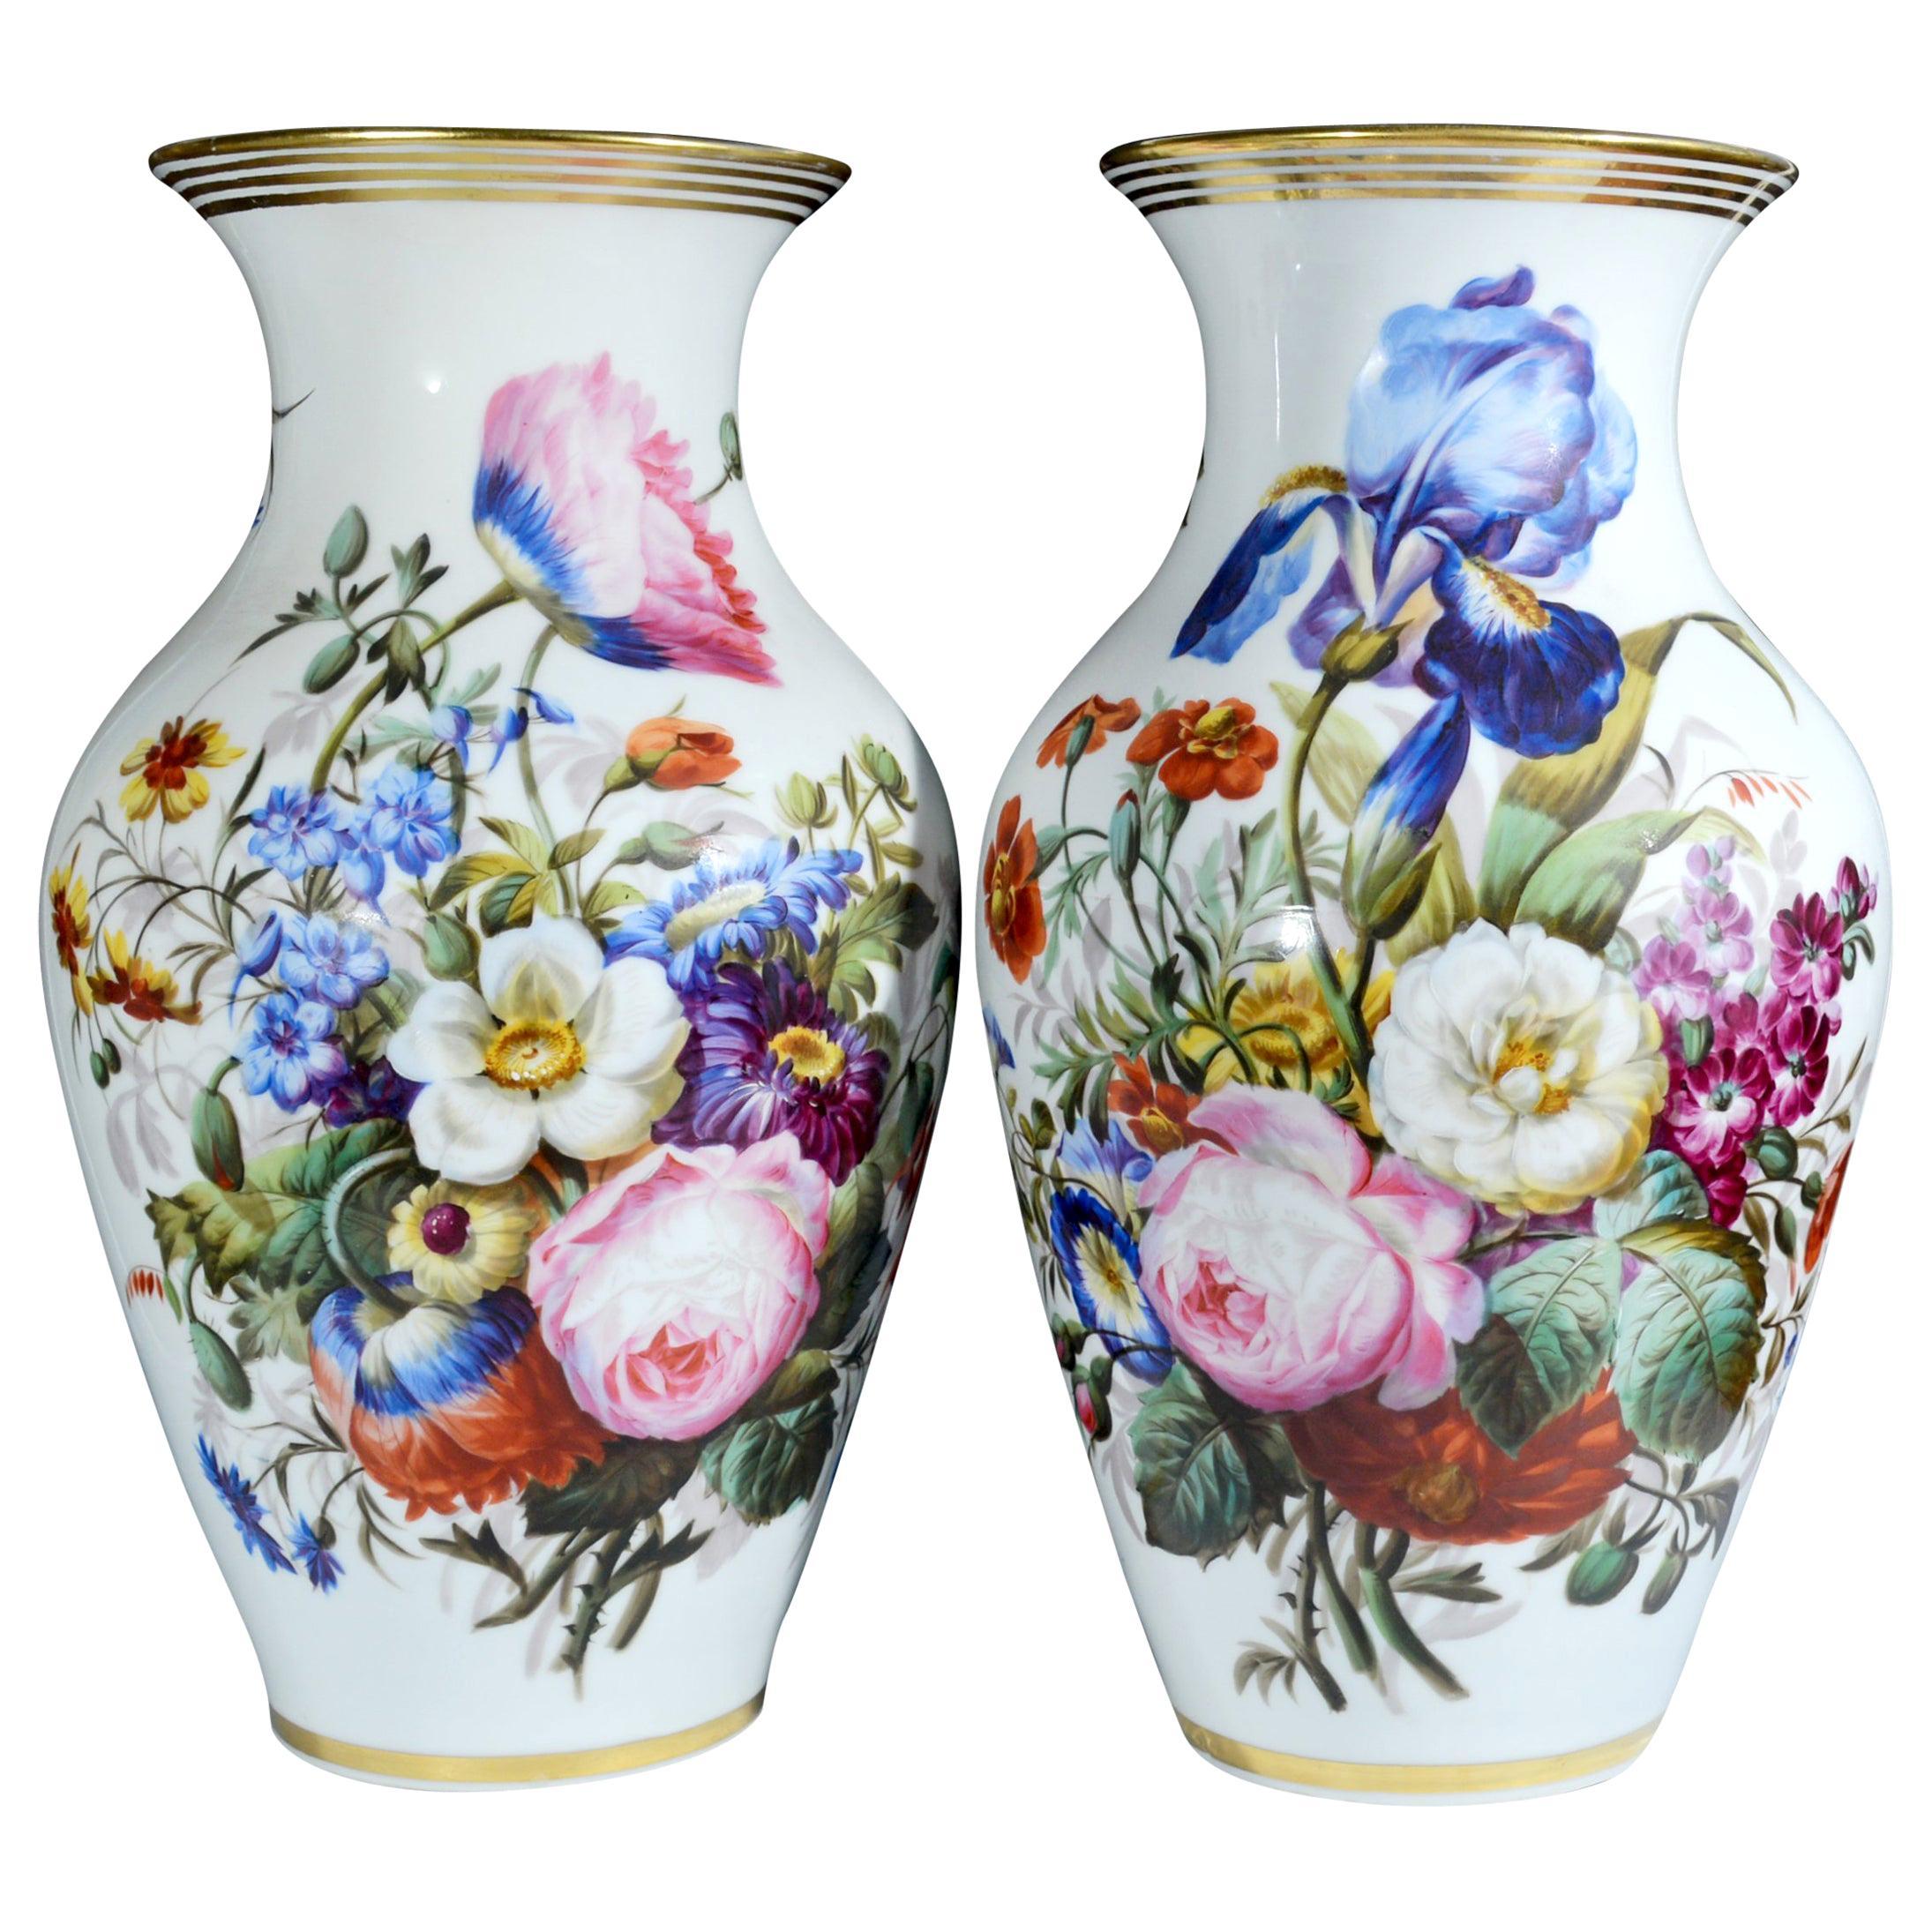 Pair of French Paris Porcelain Botanical Vases, Mid-19th Century